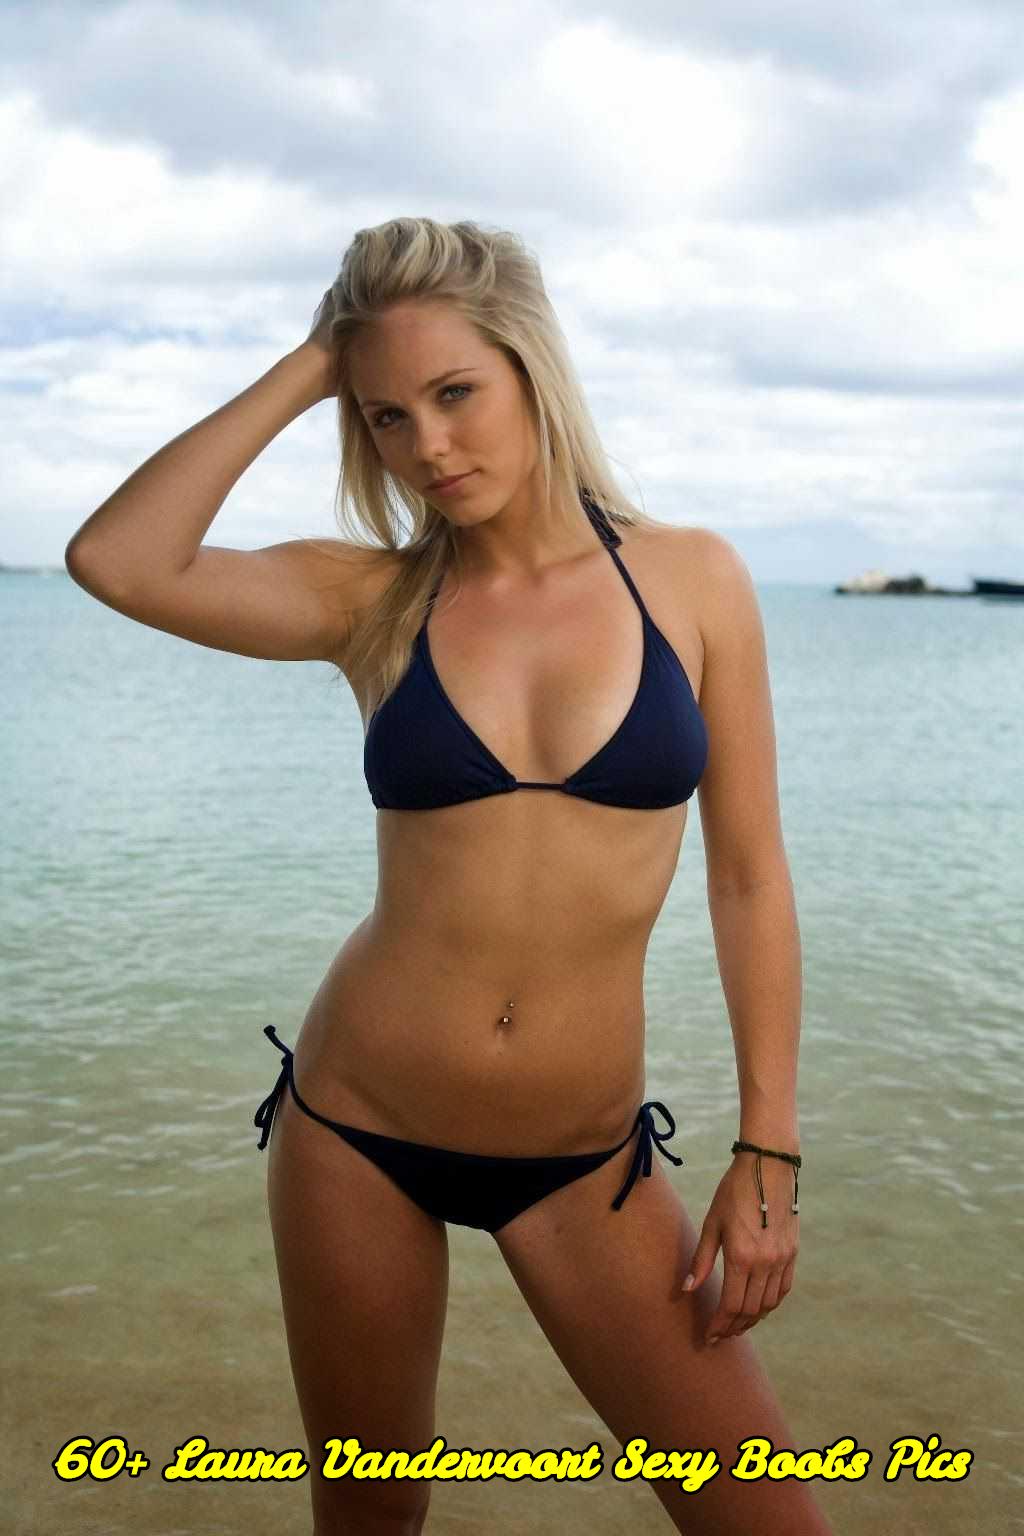 Laura Vandervoort sexy boobs pics